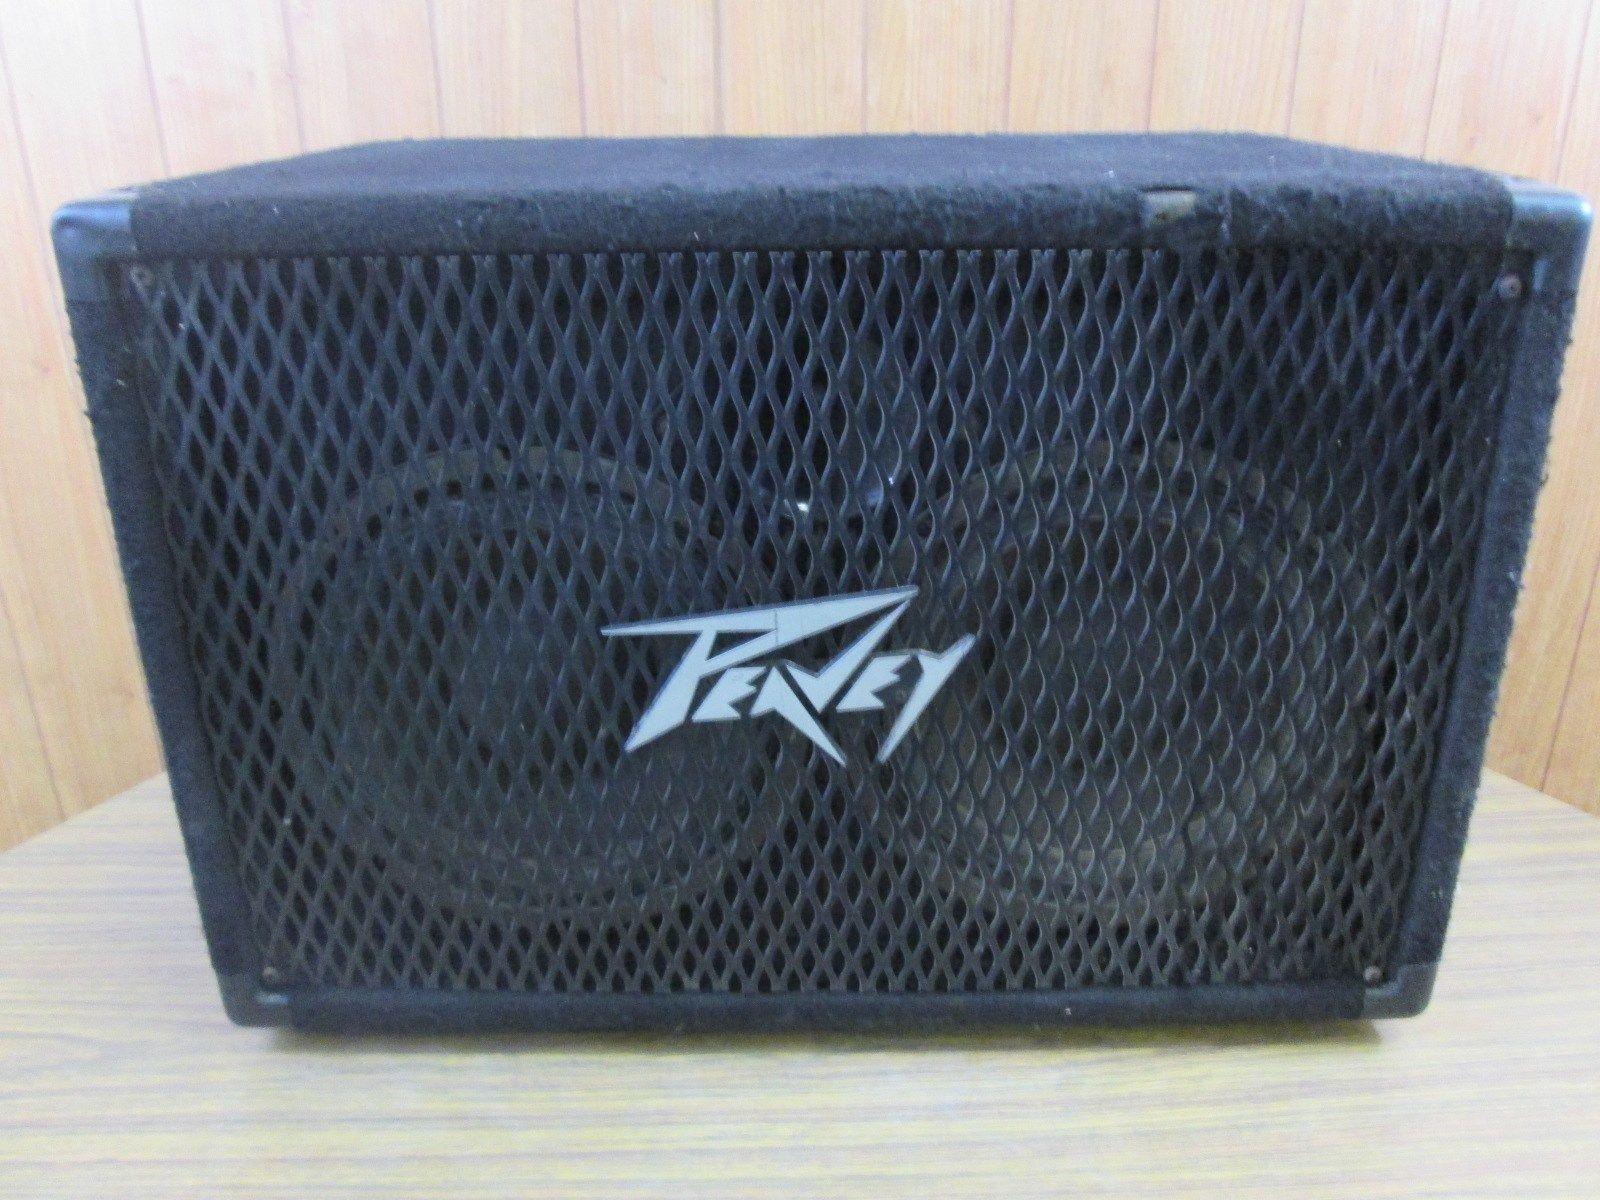 Peavey Headliner 210 Bass Speaker Cabinet 2x 350W Subs 210TX 210 TX